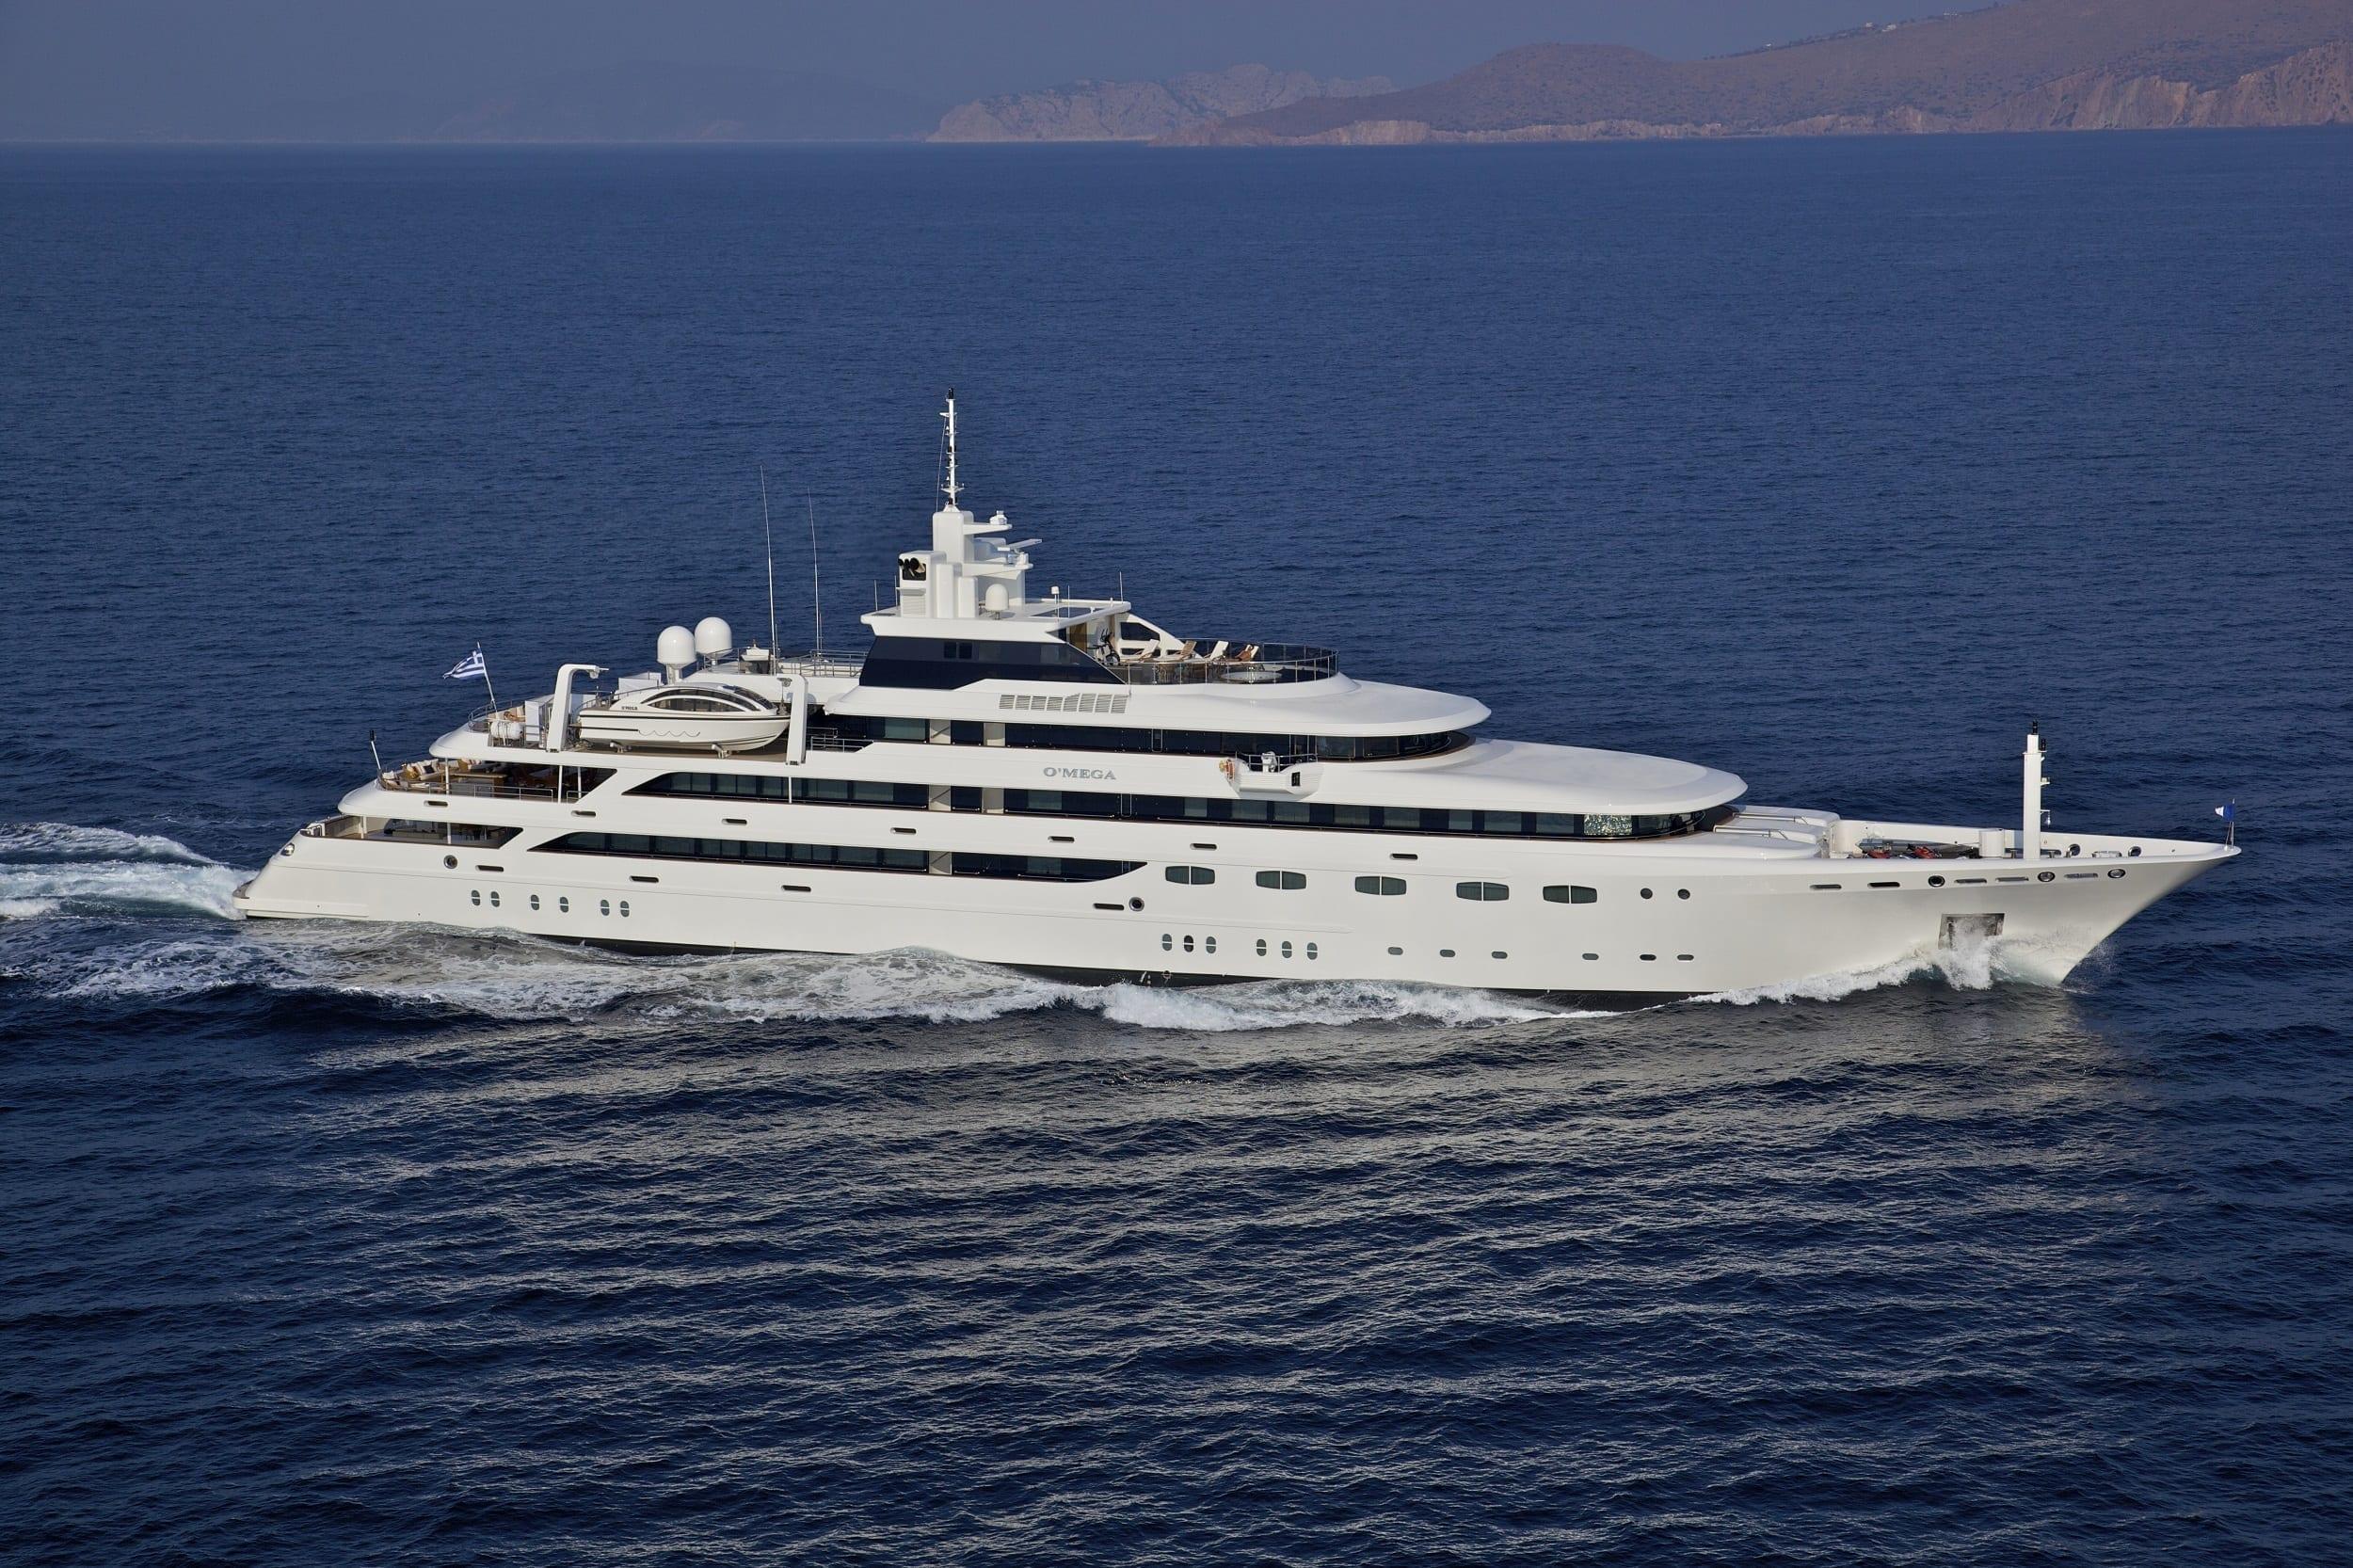 Hire The Princess 82M Omega Yacht   Princess Yacht Charter